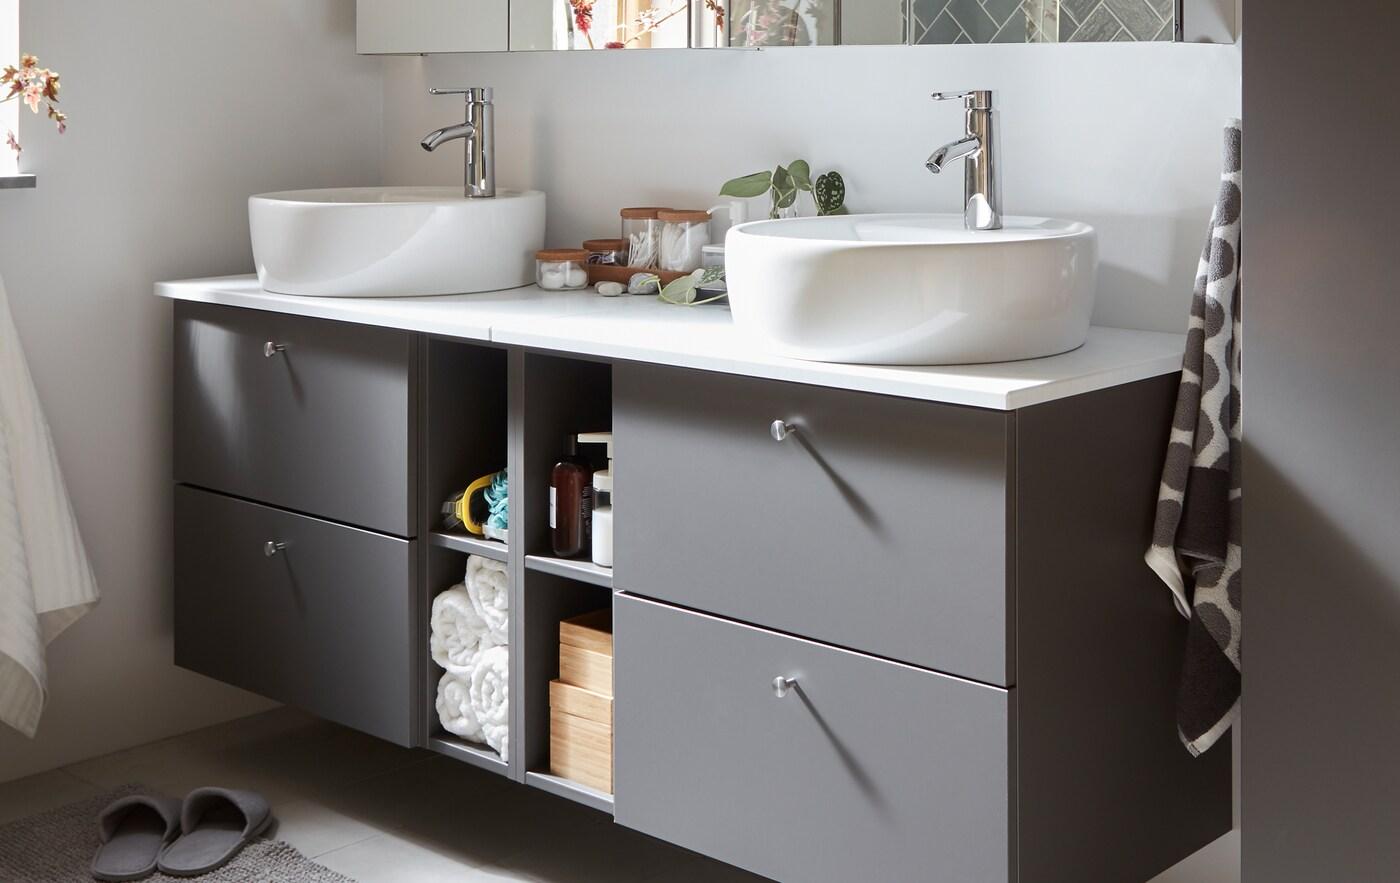 Simple ideas that make your bathroom grow